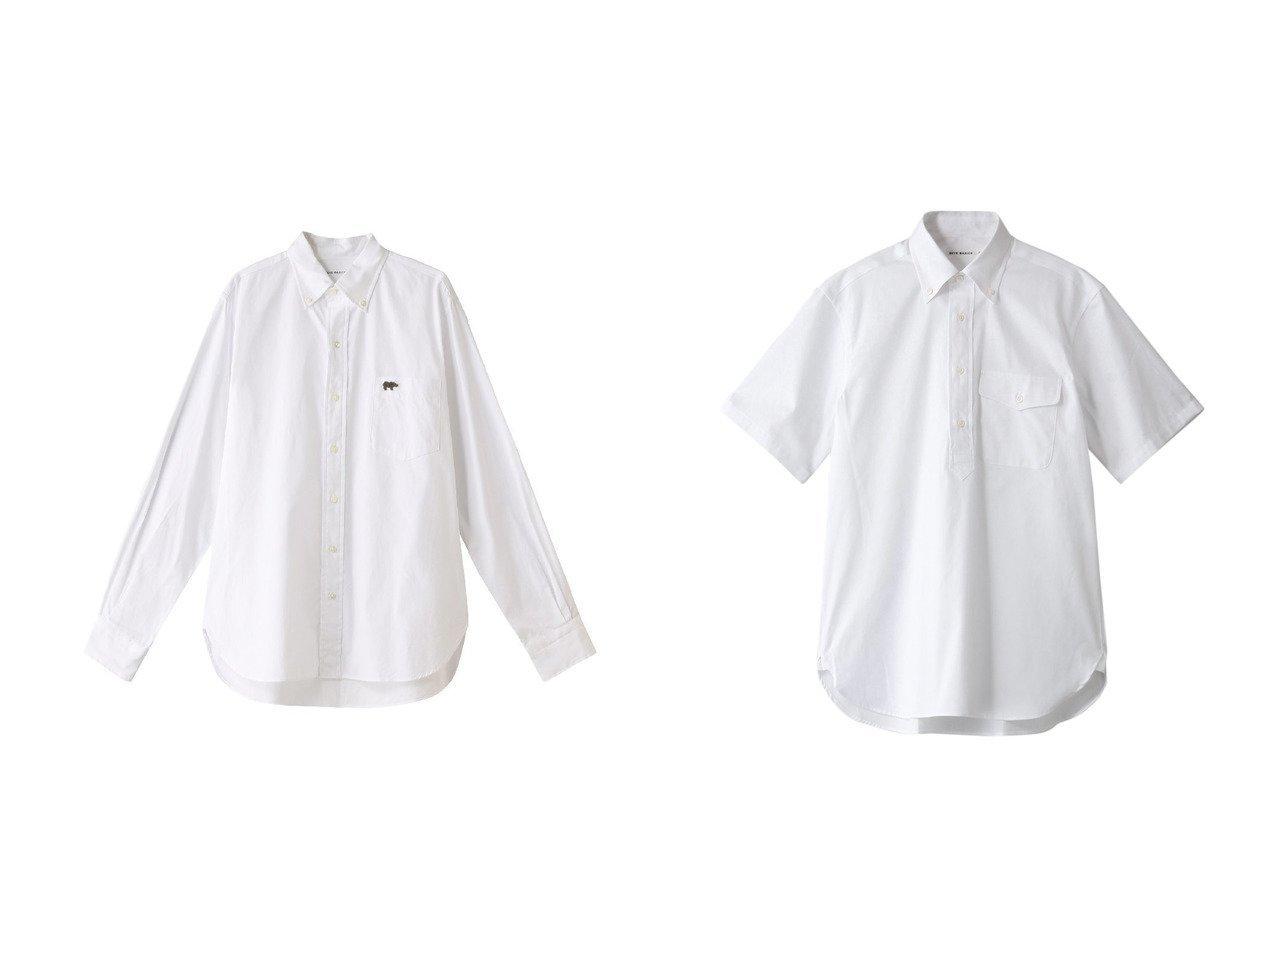 【Scye SCYE BASICS / MEN/サイ サイベーシックス】の【MEN】フィンクスコットンオックスフォードボタンダウンカラープルオーバーシャツ&【MEN】フィンクスコットンオックスフォードボタンダウンカラーシャツ 【MEN】Scye SCYE BASICSのおすすめ!人気トレンド・男性、メンズファッションの通販 おすすめで人気の流行・トレンド、ファッションの通販商品 メンズファッション・キッズファッション・インテリア・家具・レディースファッション・服の通販 founy(ファニー) https://founy.com/ ファッション Fashion メンズファッション MEN トップス Tops Tshirt Men シャツ Shirts 2021年 2021 2021 春夏 S/S SS Spring/Summer 2021 S/S 春夏 SS Spring/Summer なめらか シンプル スリーブ ポケット ロング 再入荷 Restock/Back in Stock/Re Arrival 春 Spring |ID:crp329100000019444